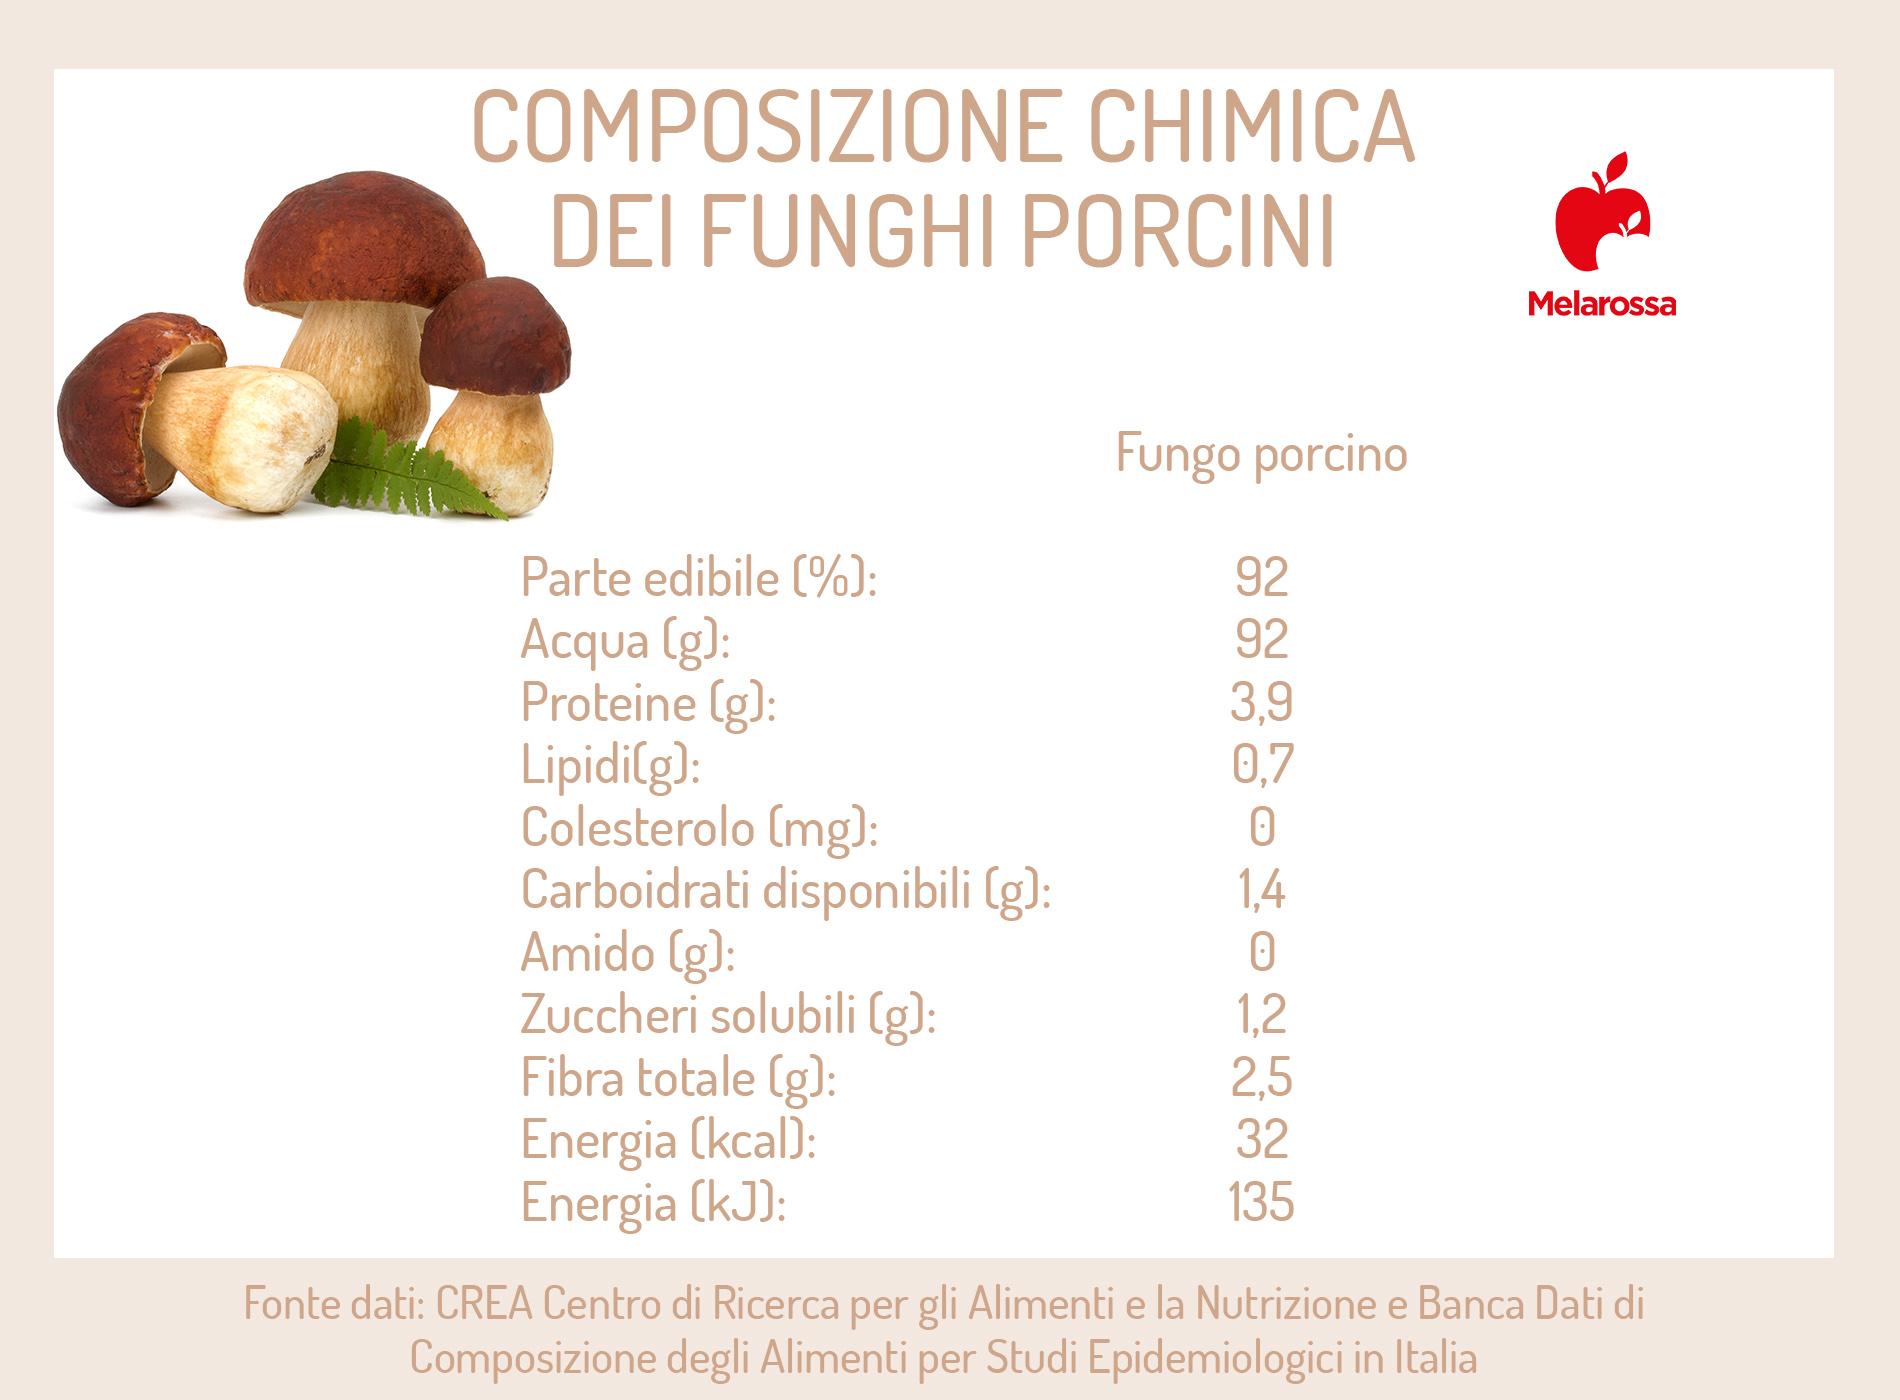 funghi porcini: calorie